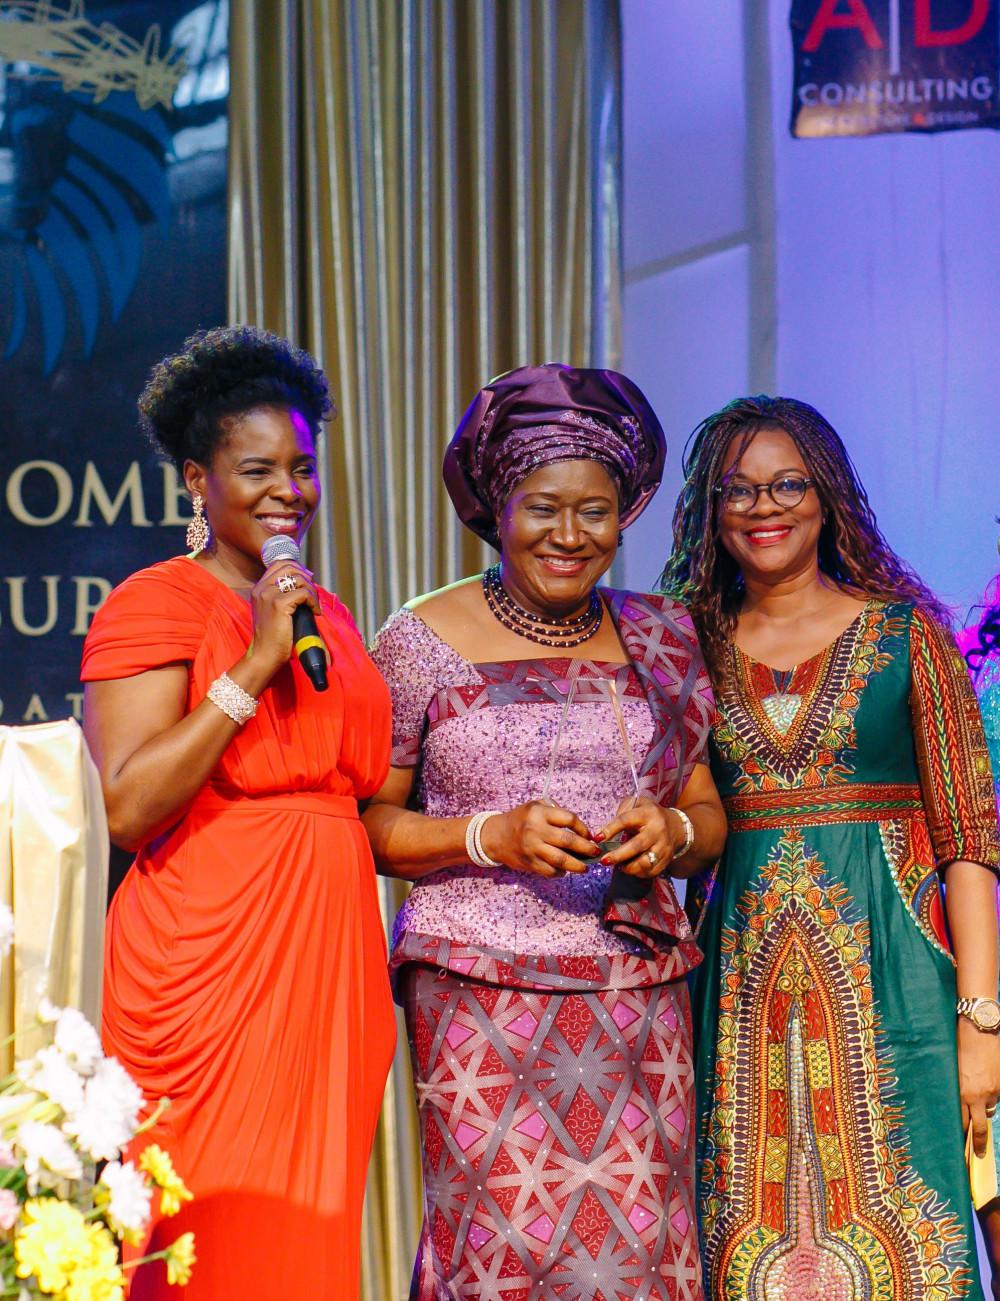 mrs-olajumoke-adenowo-igwenwanyi-ngozi-chinwe-achebe-mrs-adesuwa-onyenokwe